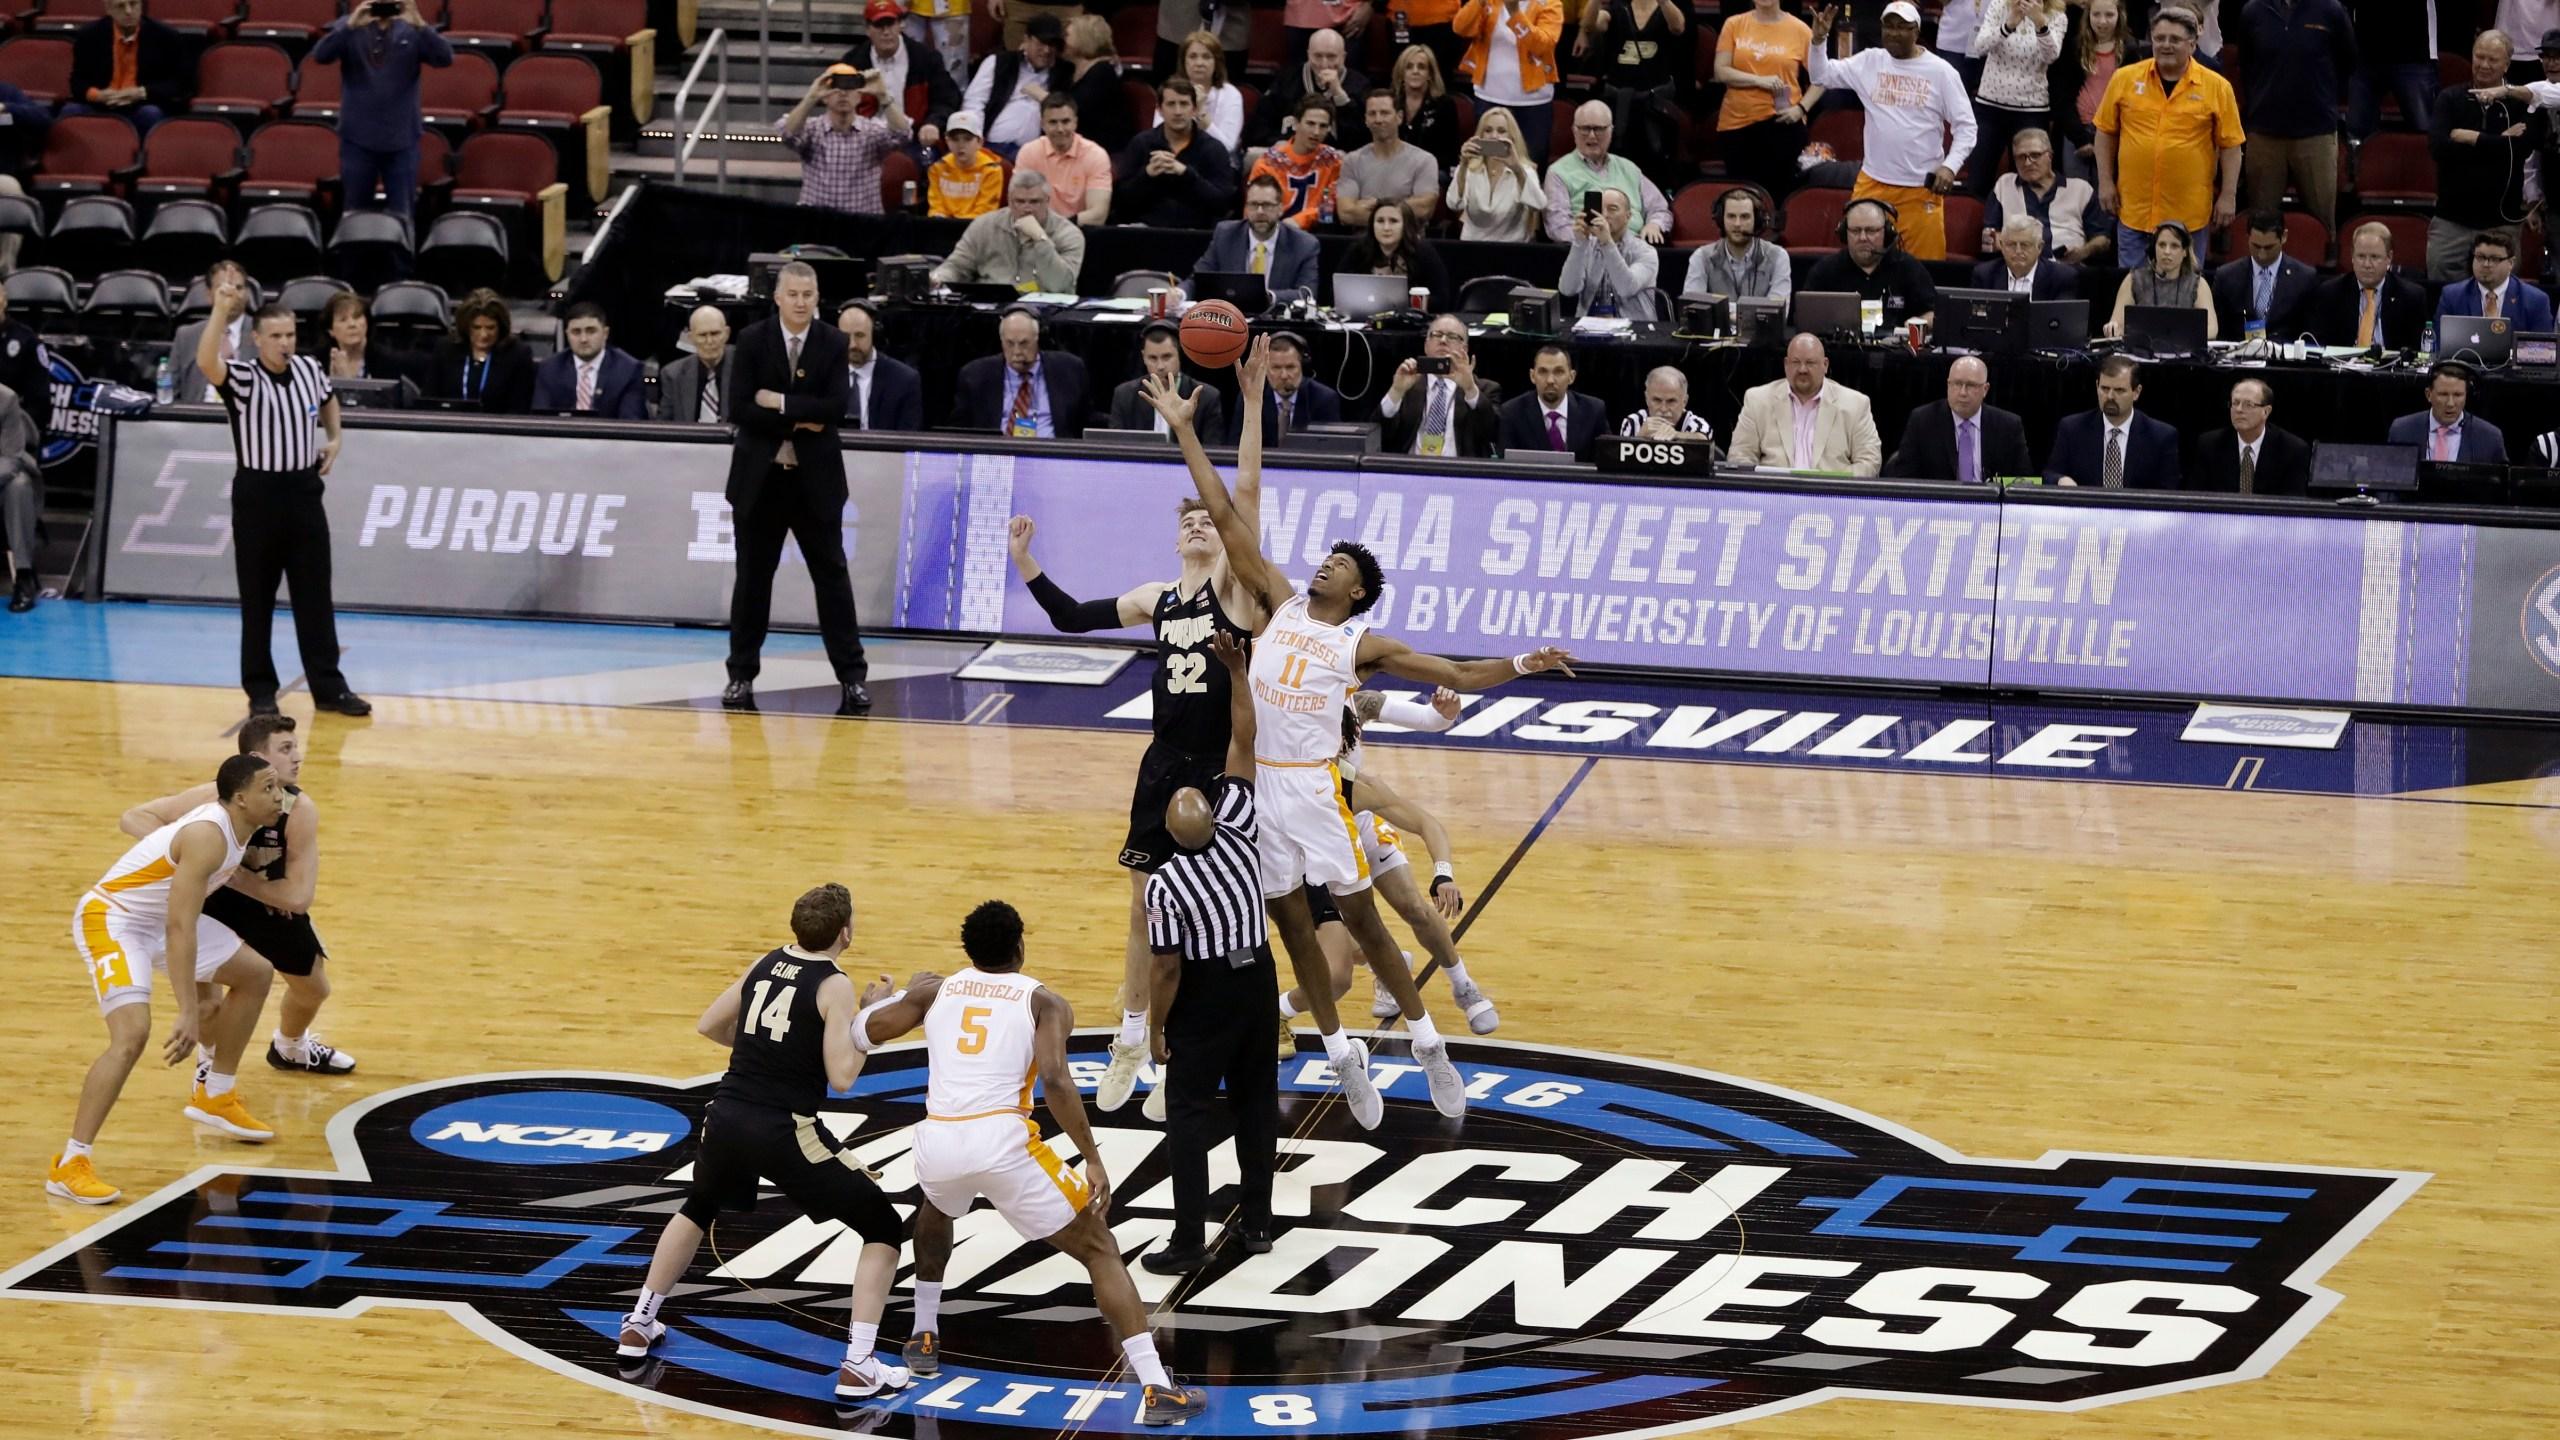 NCAA Purdue Tennessee Basketball_1553827268114-873774424